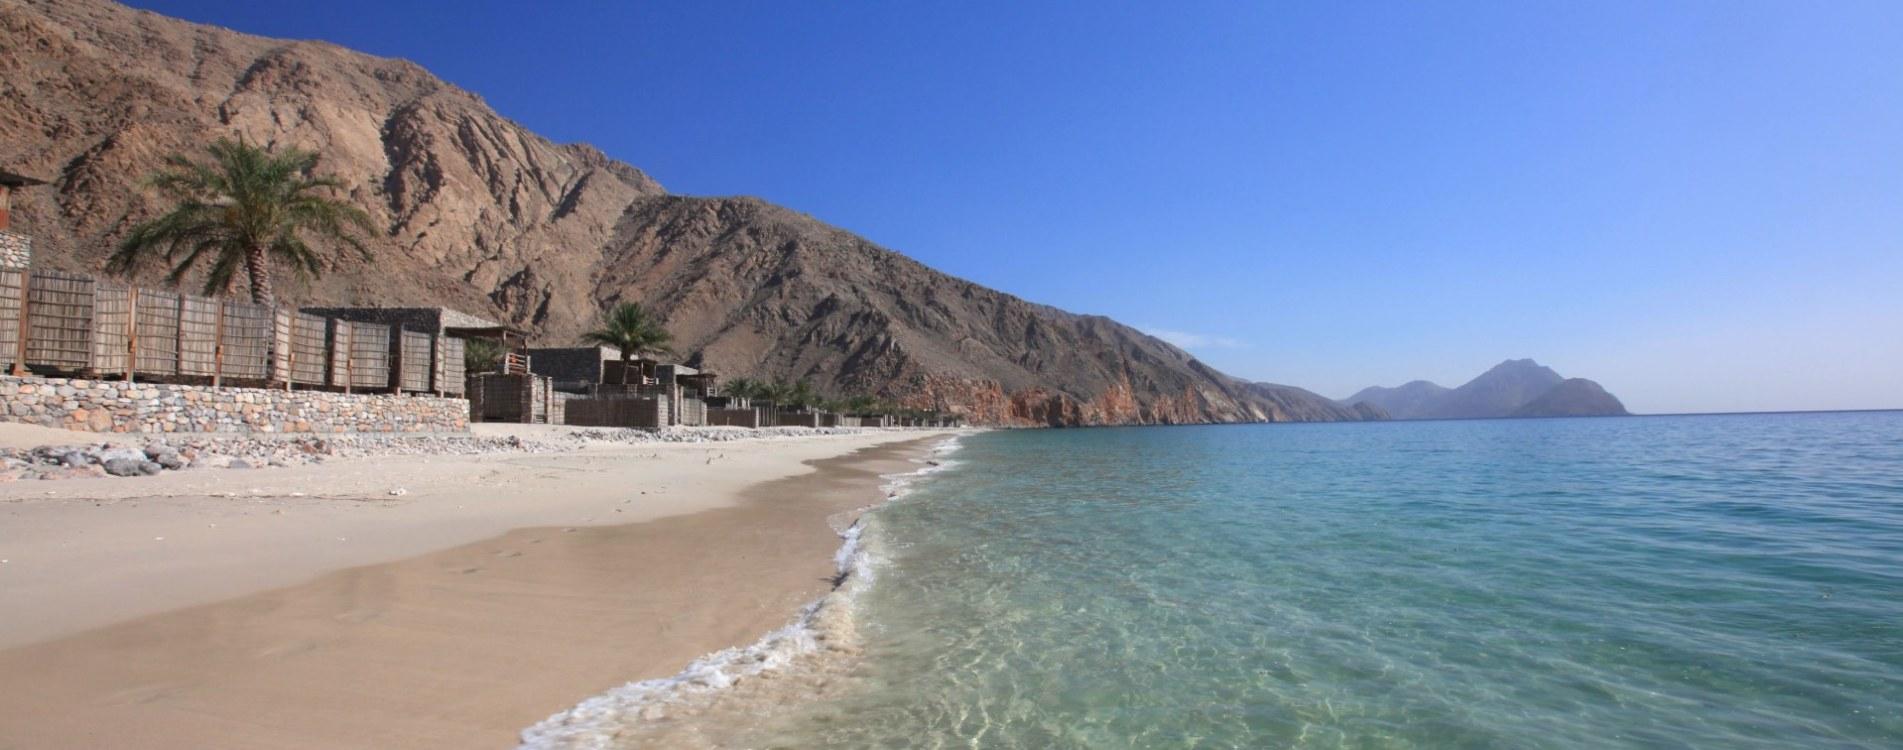 Six-Senses-Zighy-Bay-Privatstrand-Küste-Oman.jpg